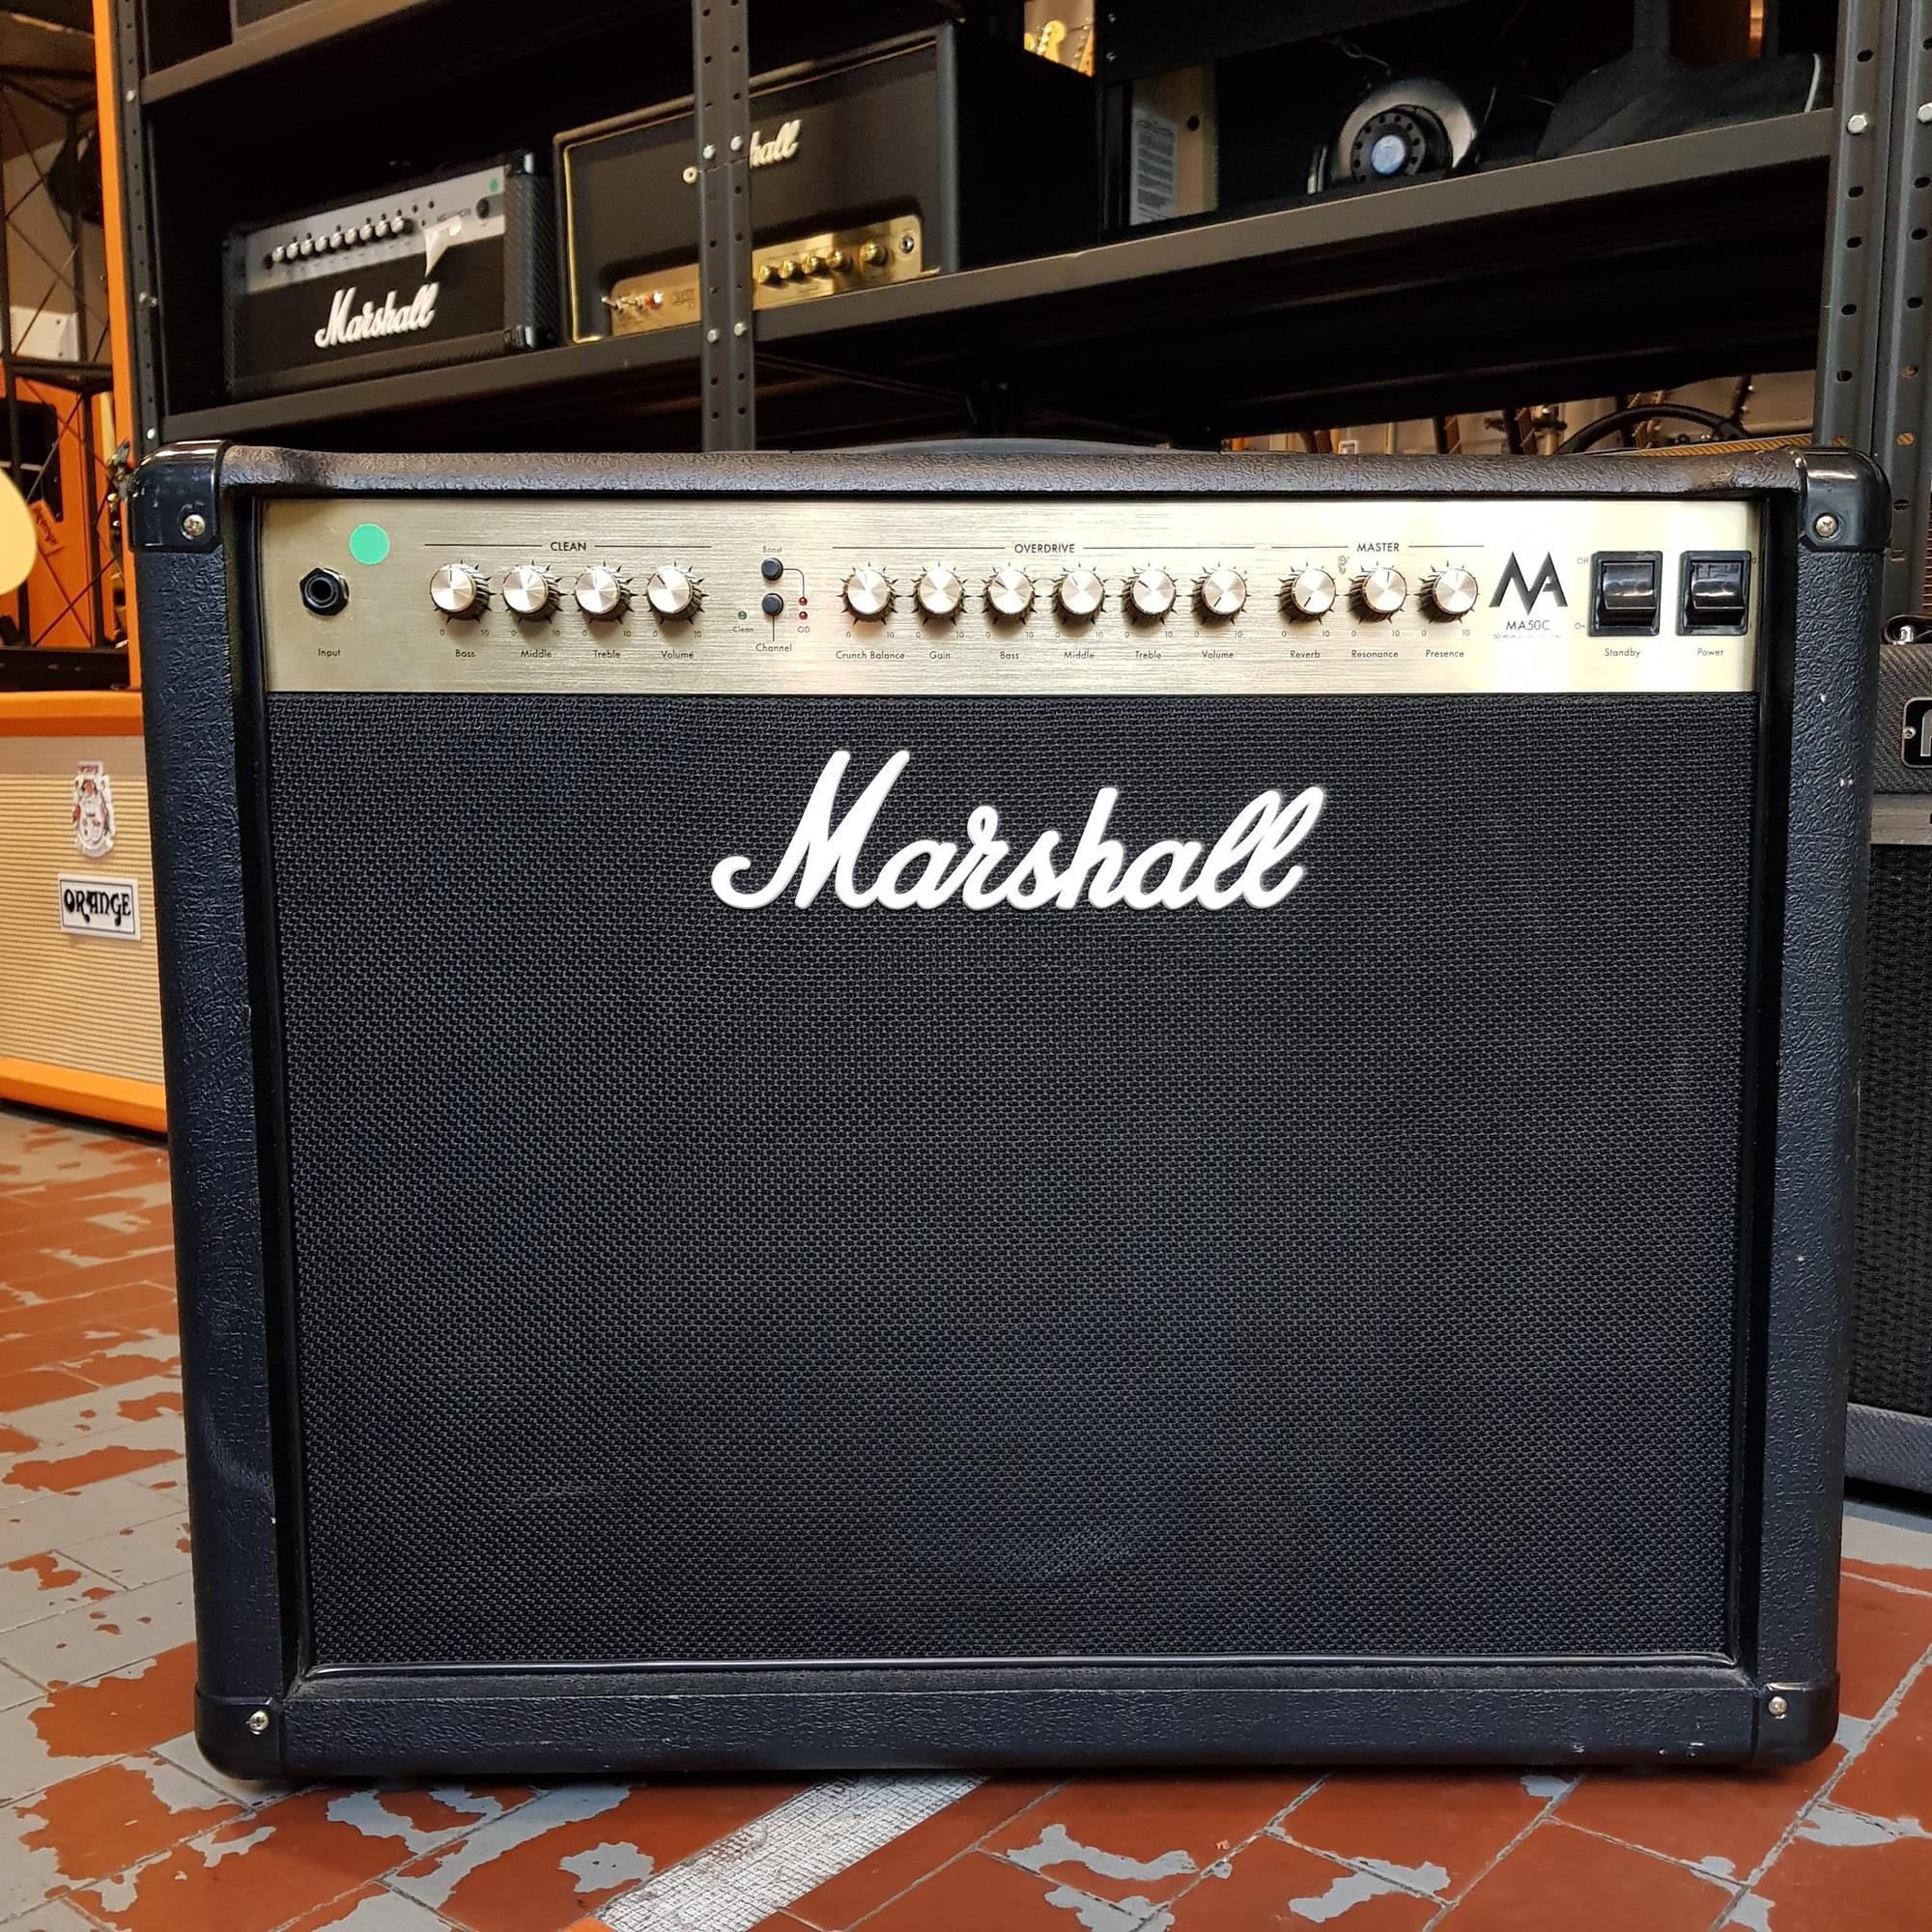 MARSHALL-MA50C-FOOTSWITCH-sku-1619853490012